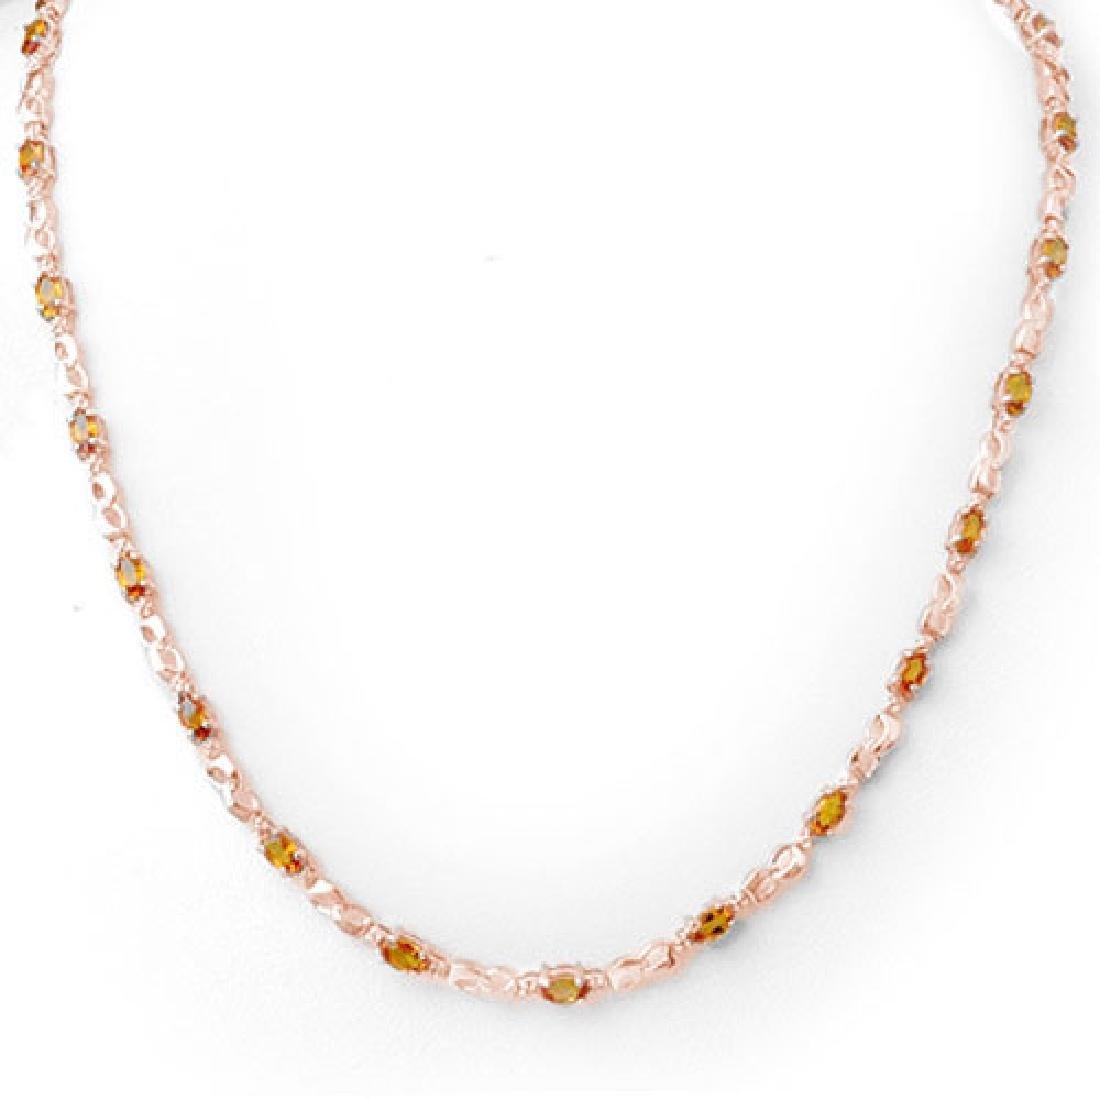 9.02 CTW Orange Sapphire & Diamond Necklace 14K Rose